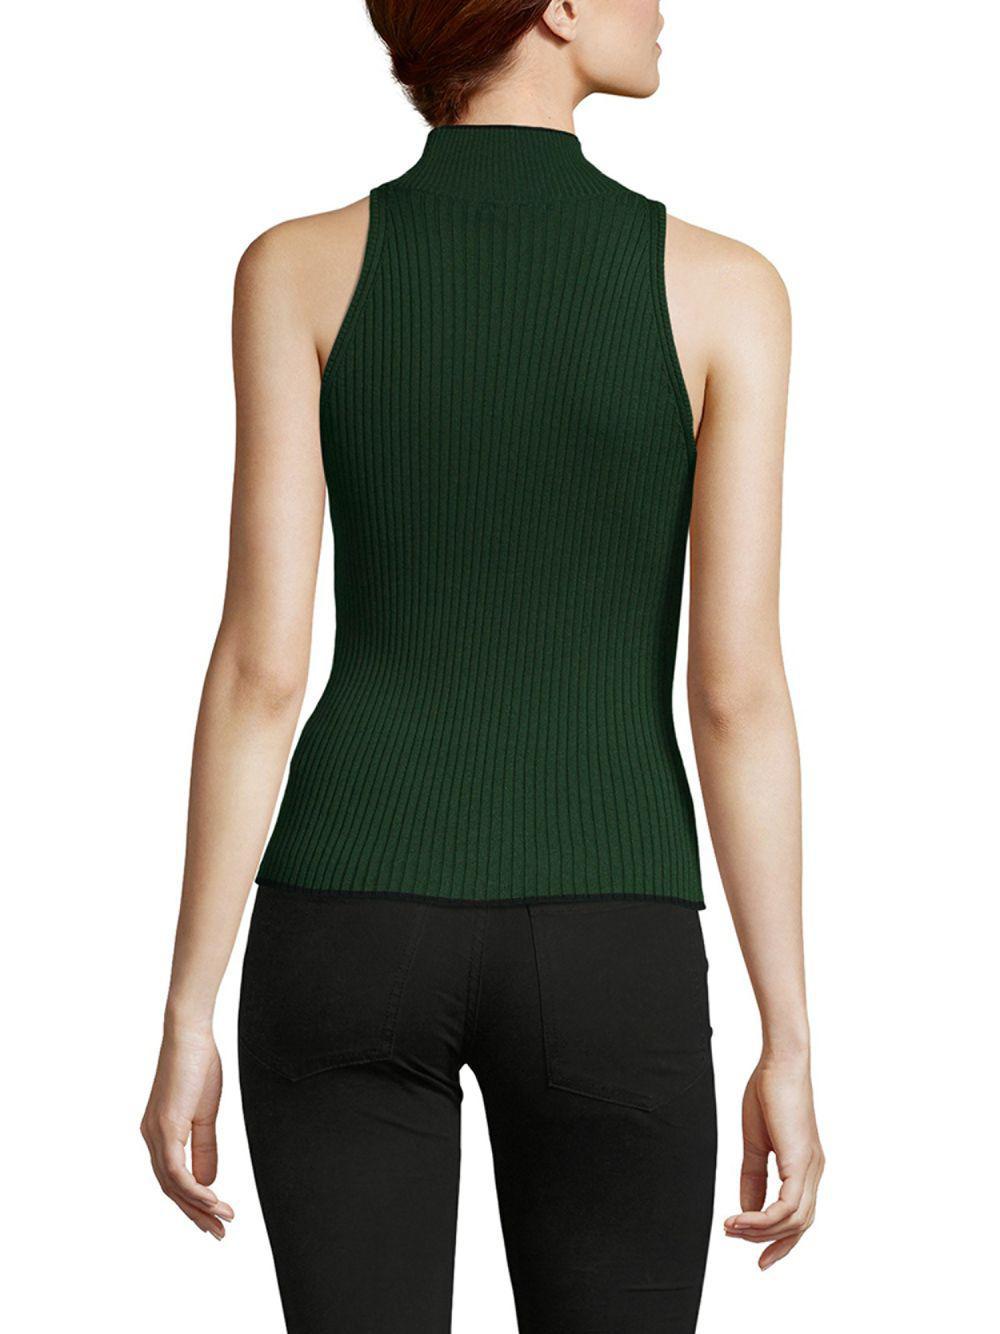 49c6d731631a0 Ronny Kobo - Green Ribbed Sleeveless Turtleneck - Lyst. View fullscreen